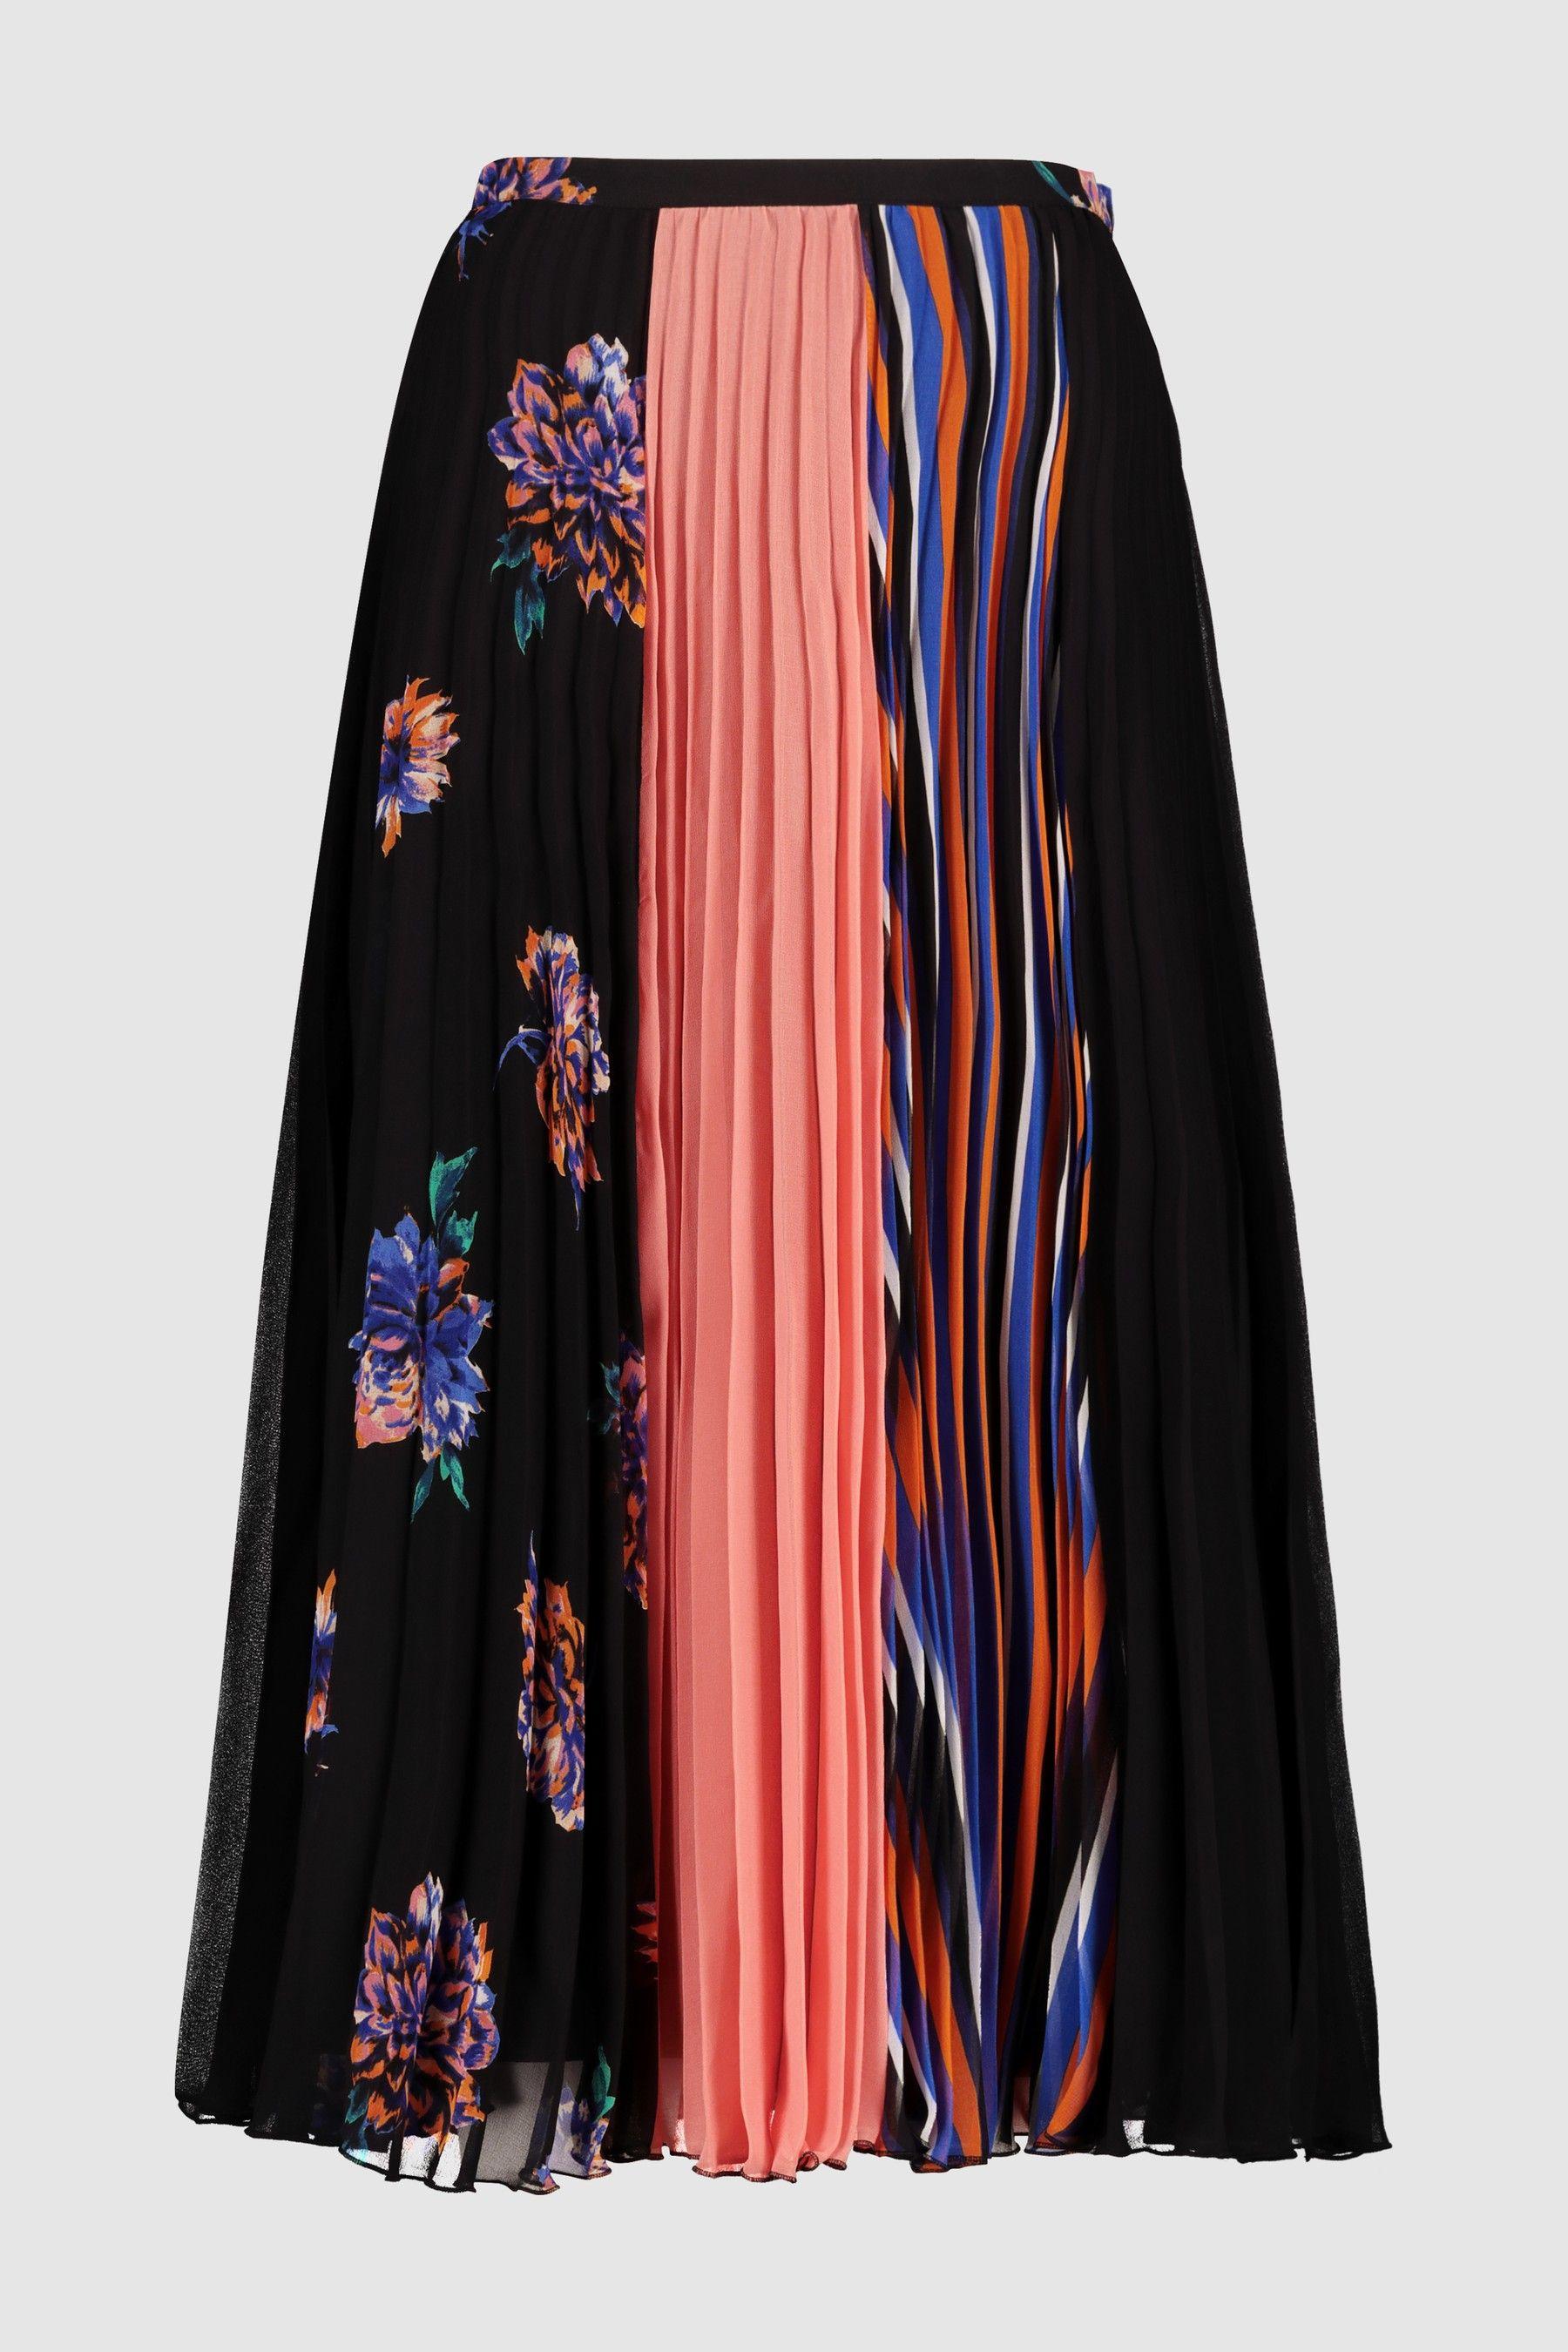 60895657d0 Womens Next Orange/Black Mixed Print Pleated Skirt - Black ...